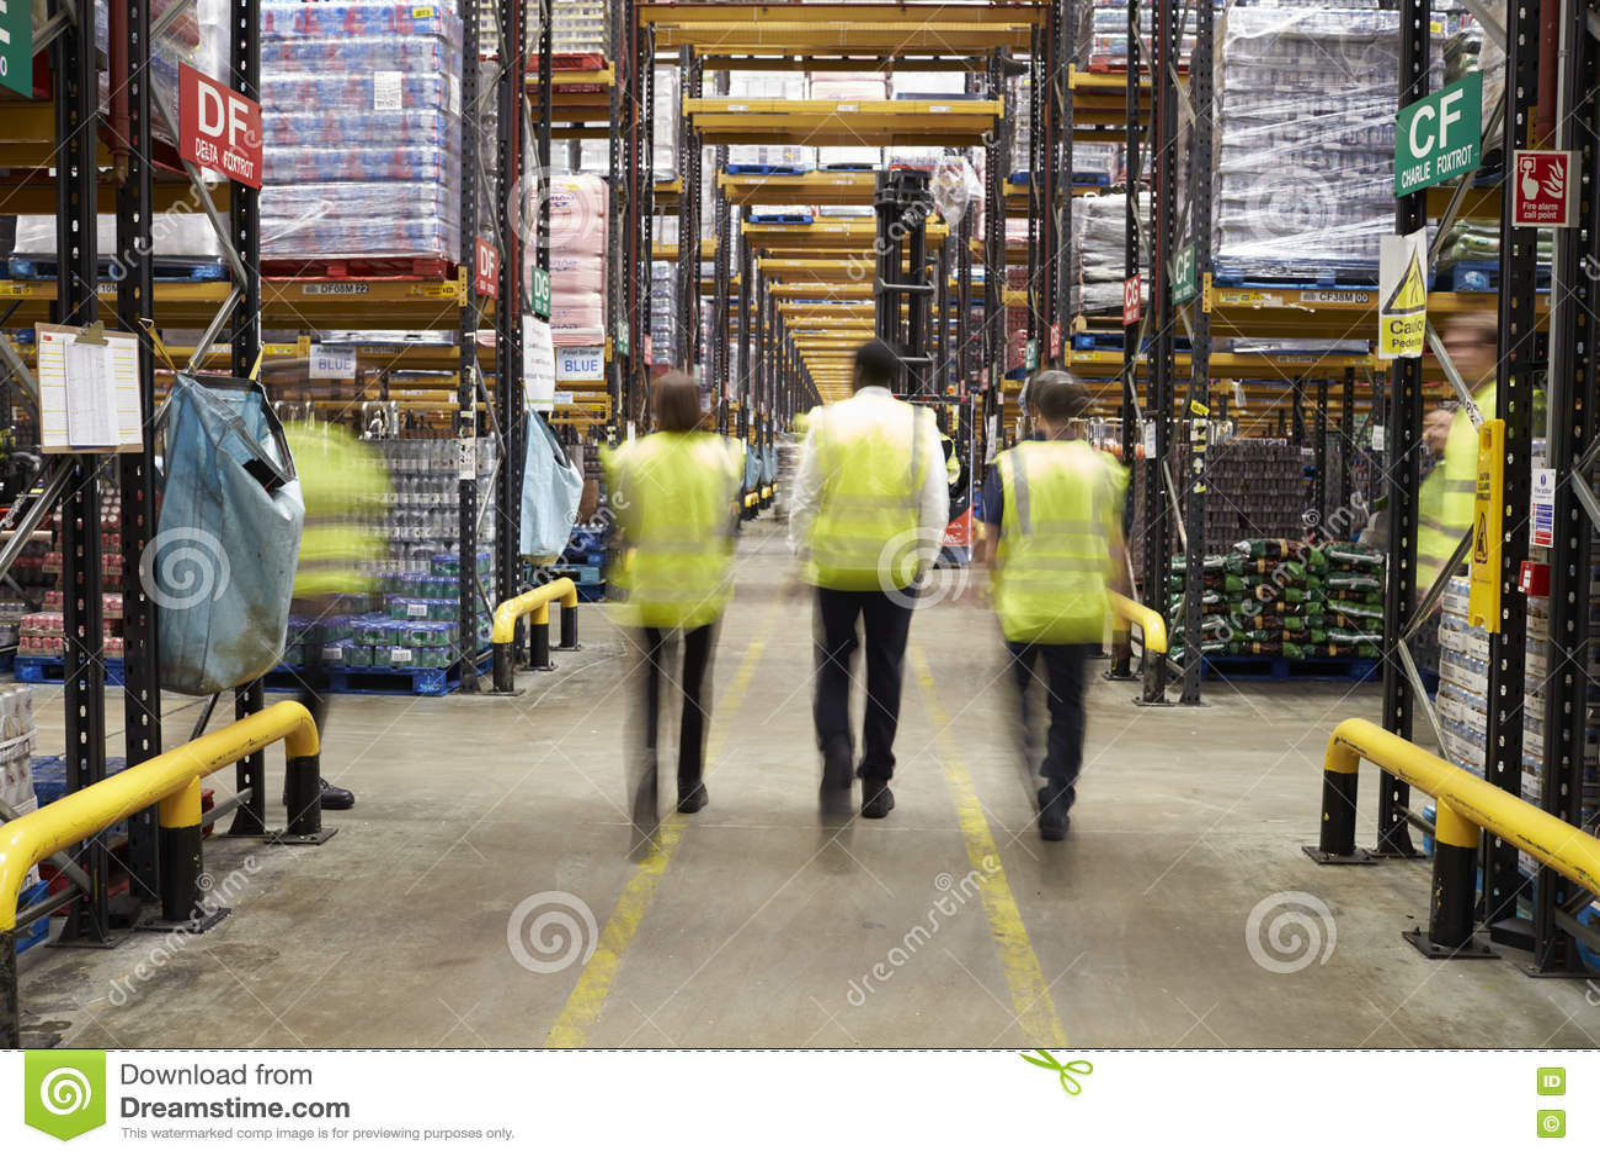 ESSEX, INGLATERRA 13 DE MARZO DE 2016: Personal en chalecos reflexivos que se niega a afrontar cámara en un almacén de distribuci